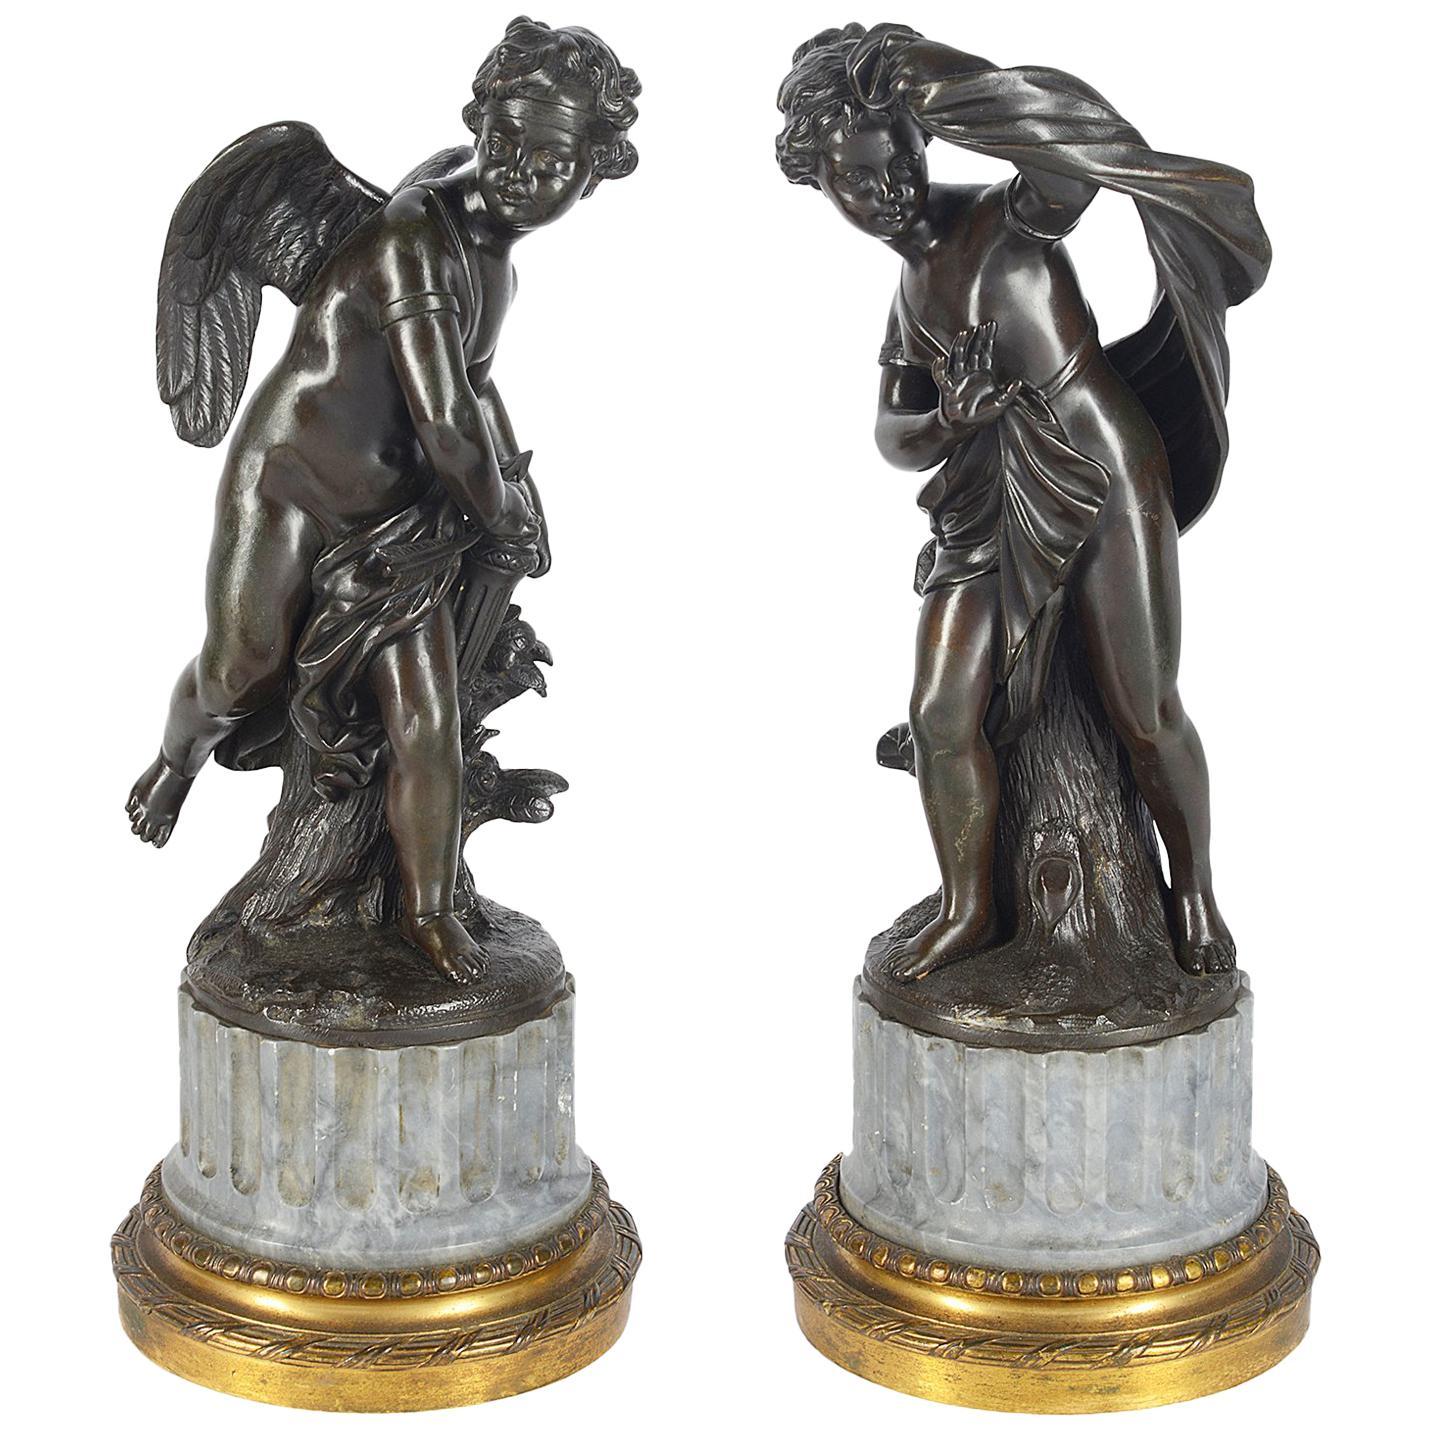 Pair of 19th Century Classical Bronze Statues